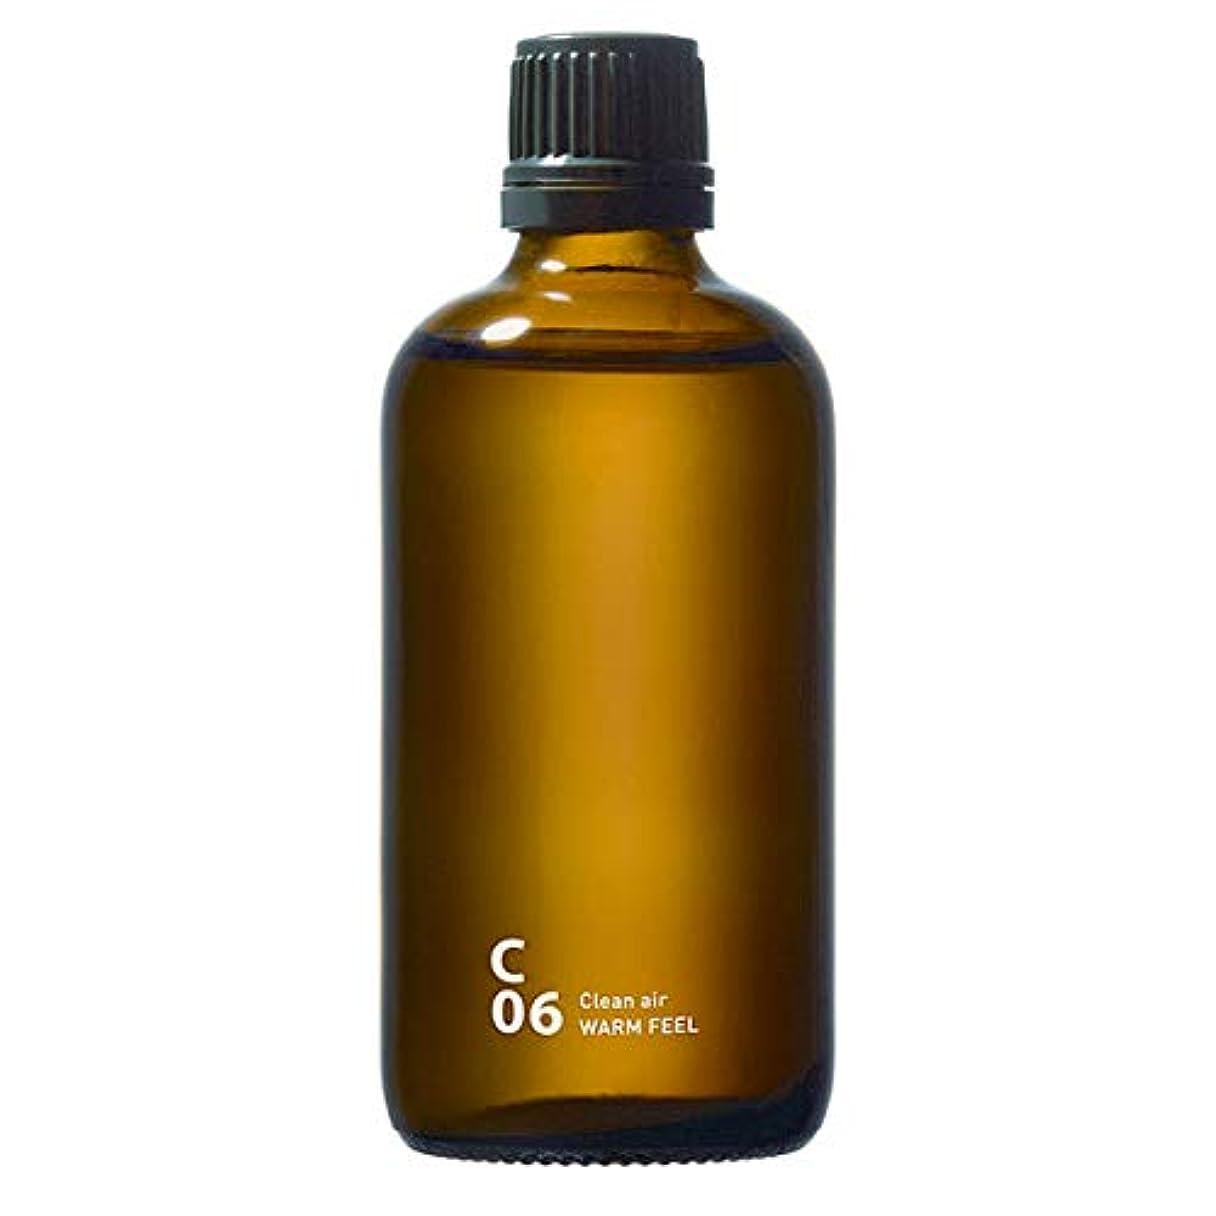 対処廃棄機関C06 WARM FEEL piezo aroma oil 100ml